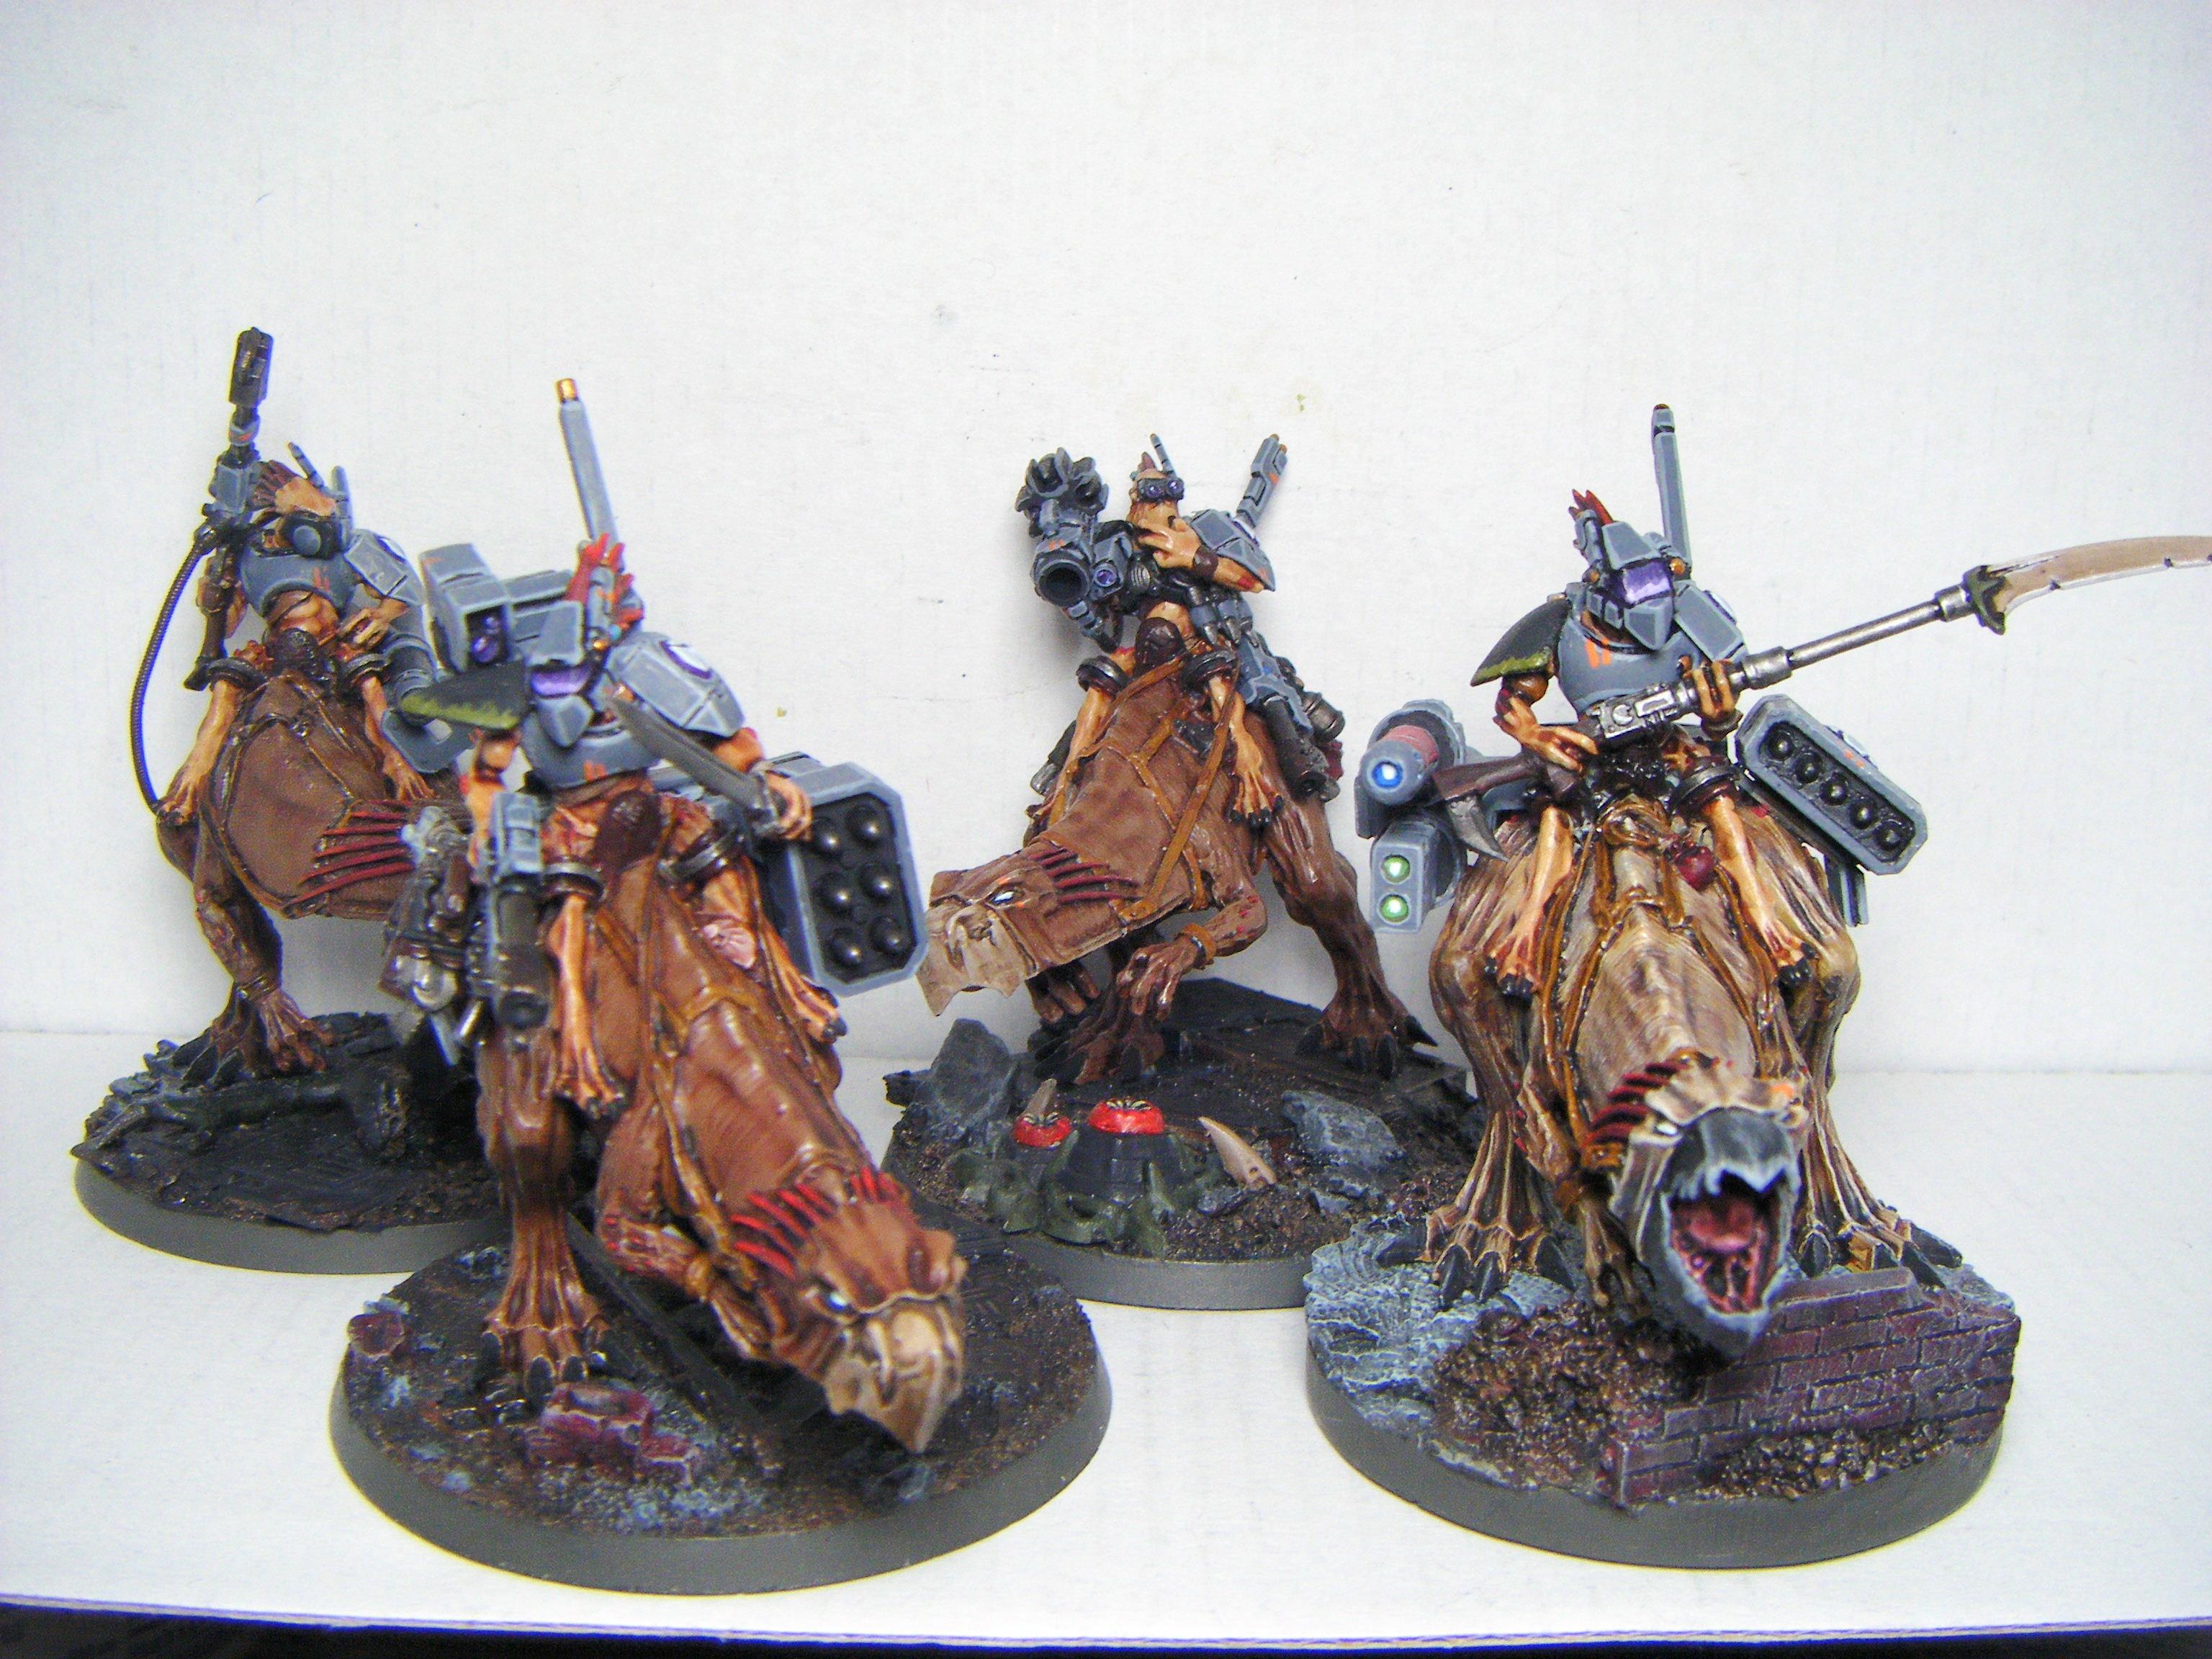 Knarloc, Kroot, Riders, Tau